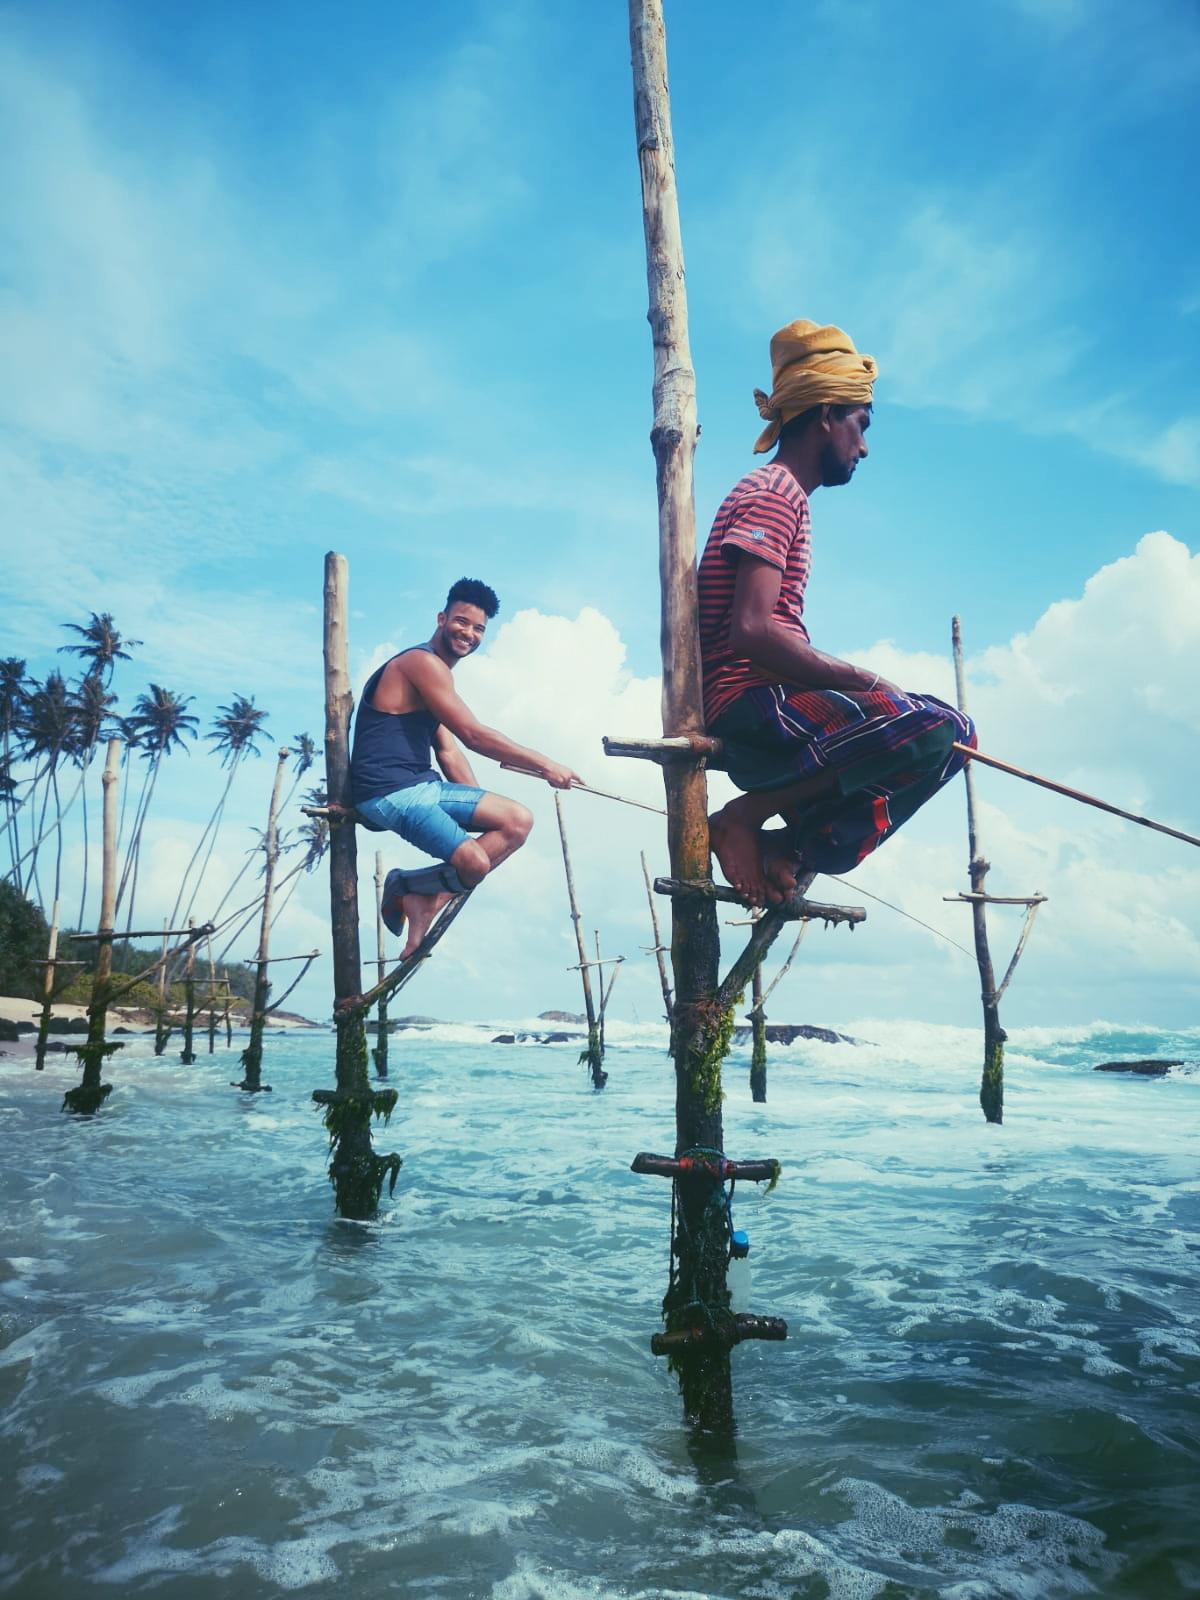 invite-to-paradise-sri-lanka-holiday-honeymoon-specialists-customer-feedback-elin-jordan-luce-stilt-fisherman-fishing-try.JPG